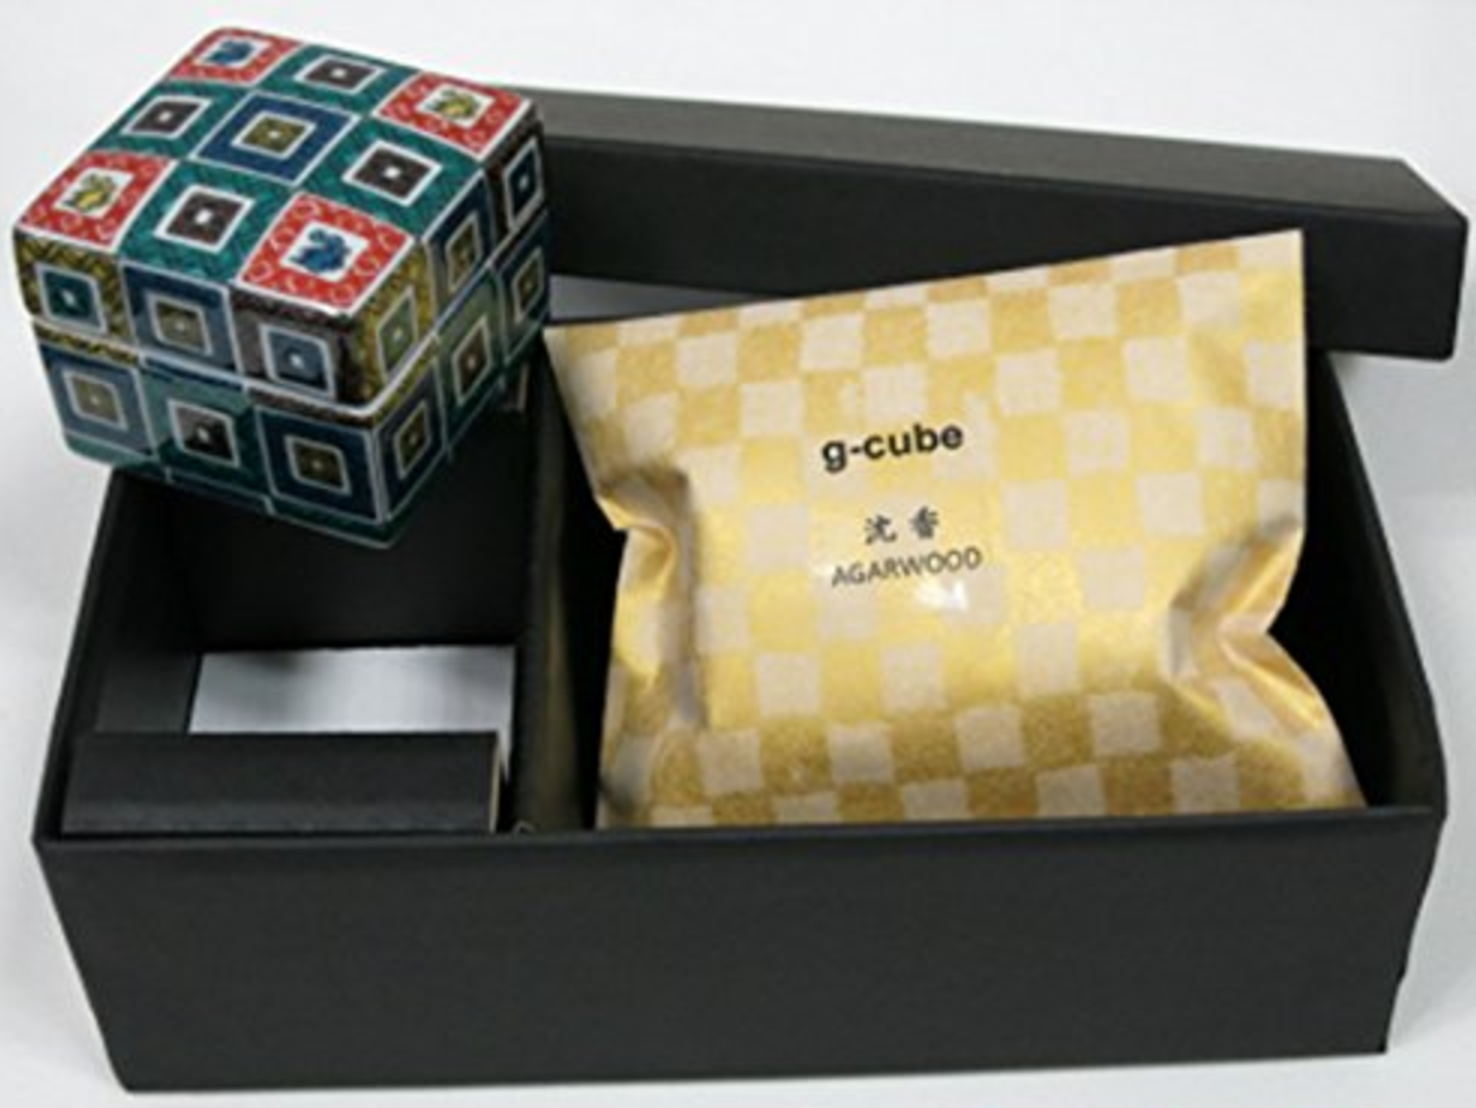 伝統工芸九谷焼 G-CUBE 香箱 セット箱